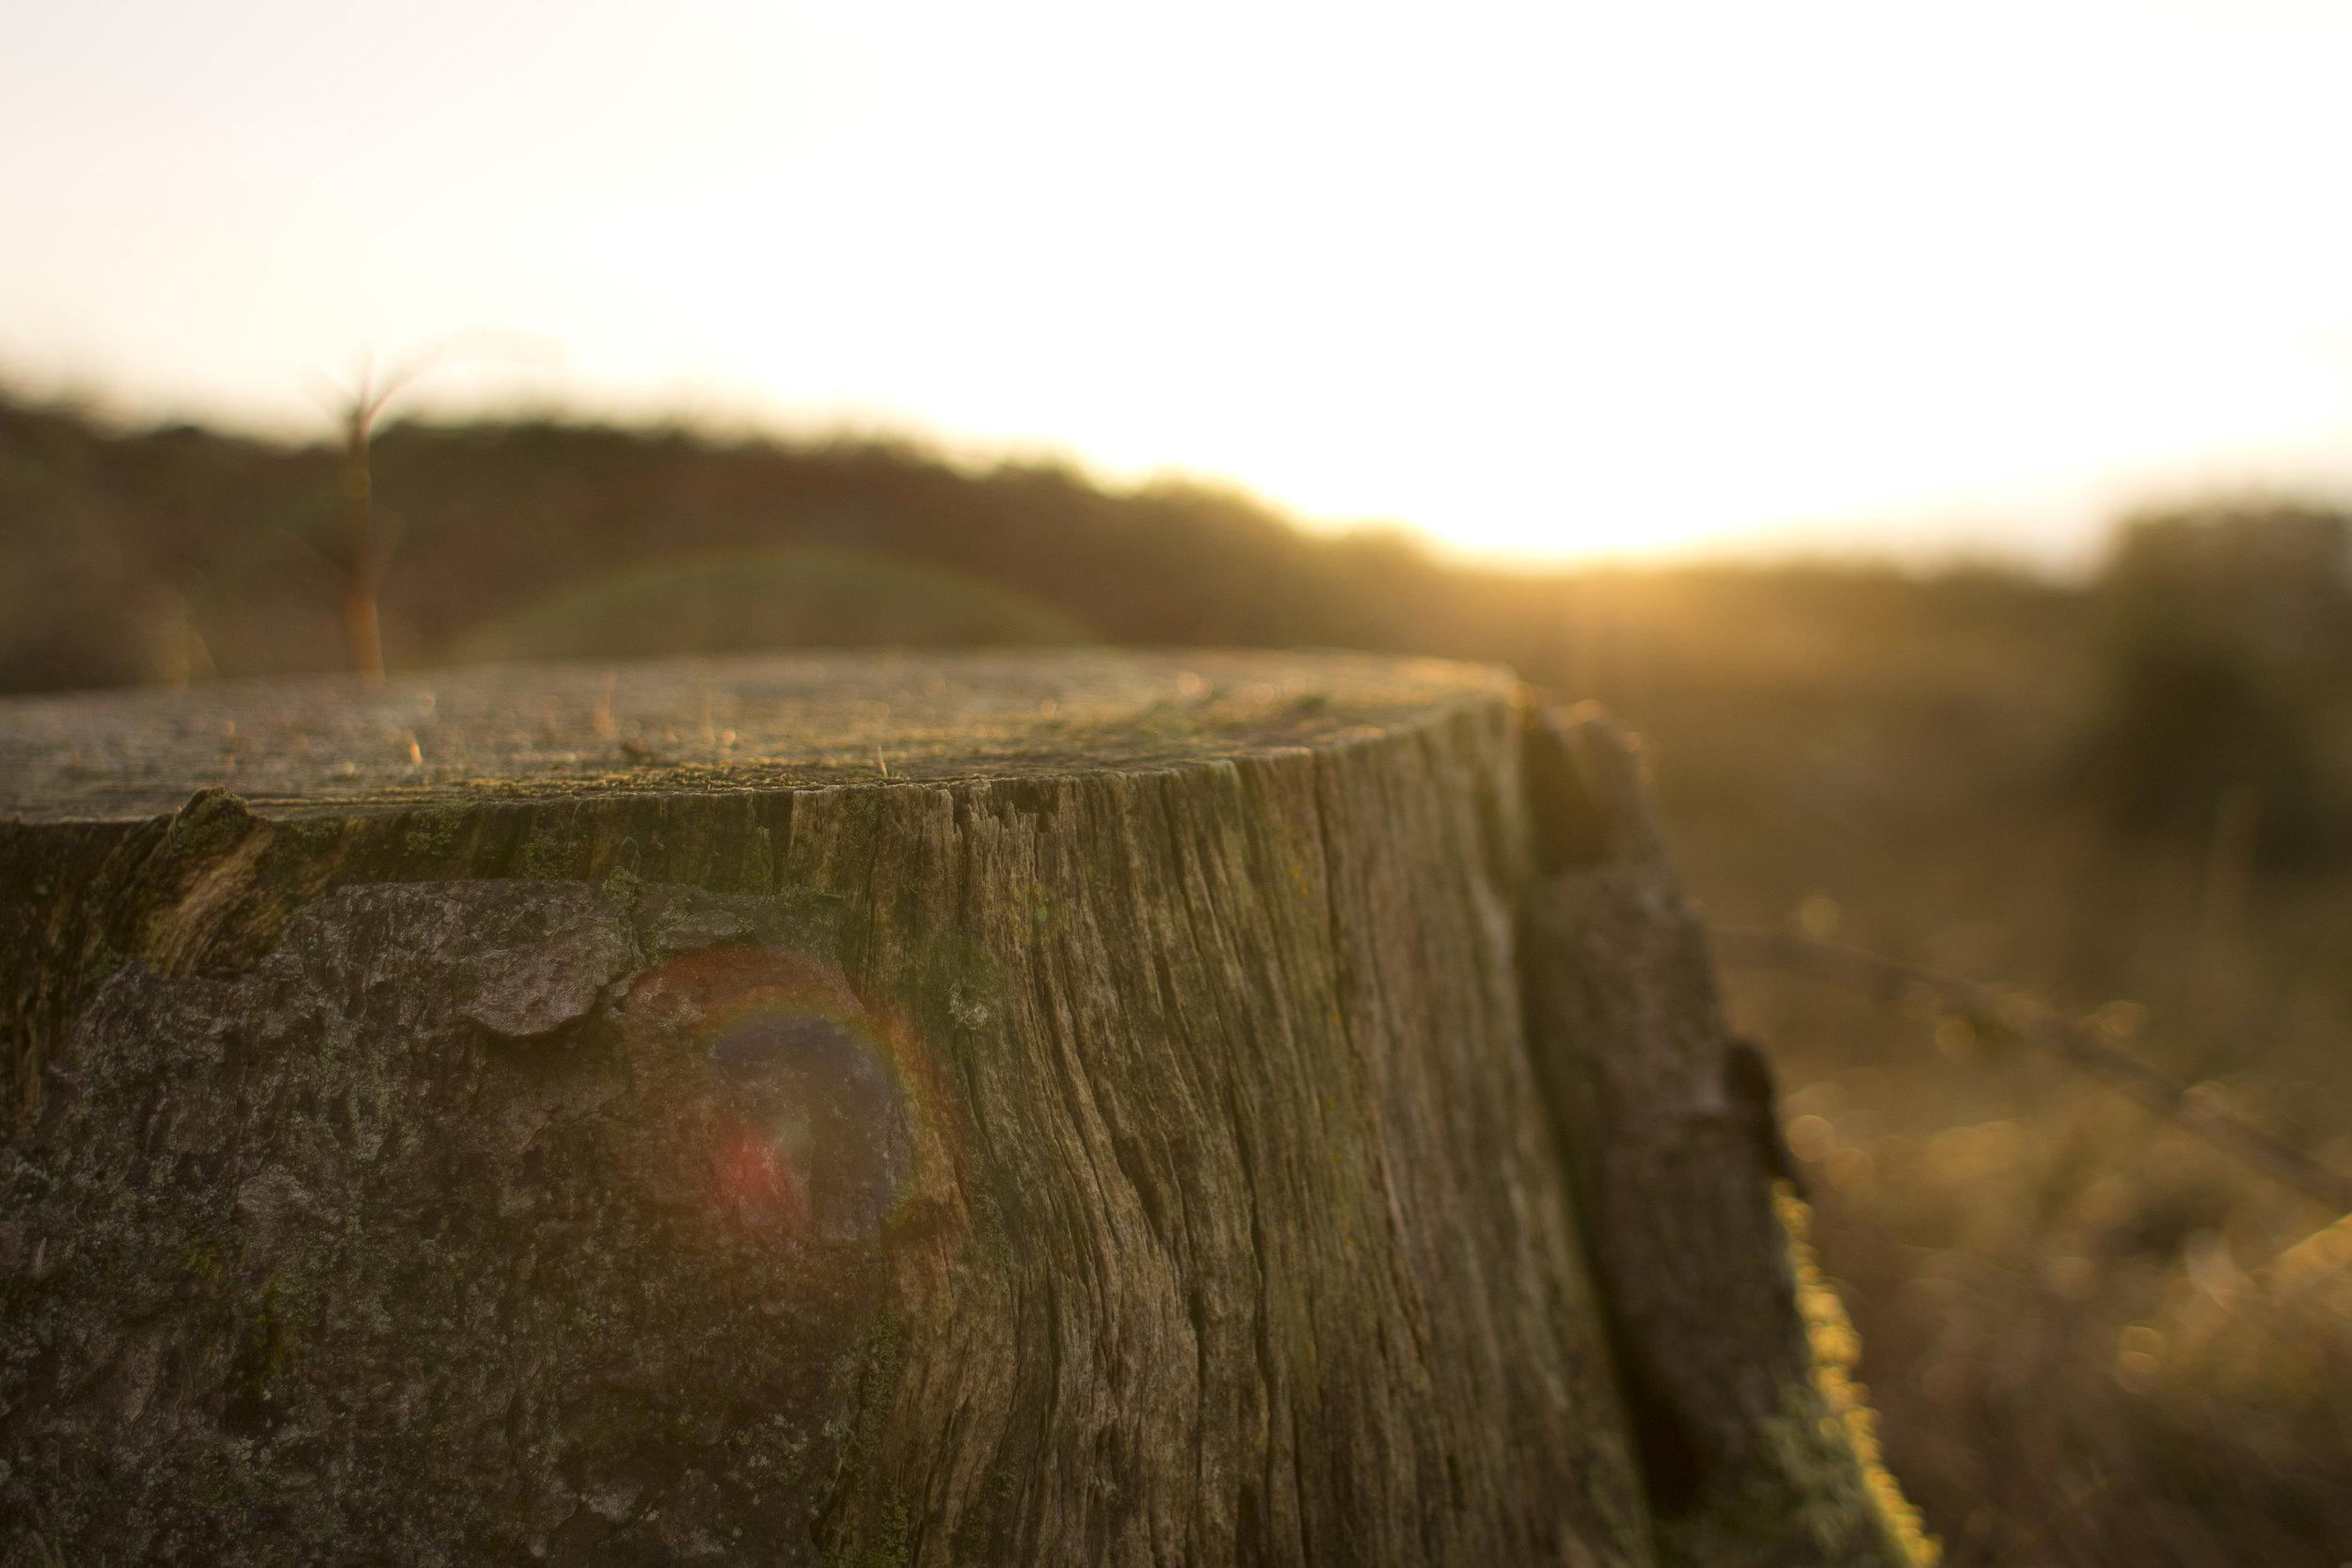 dawn-nature-sunset-dust.jpg